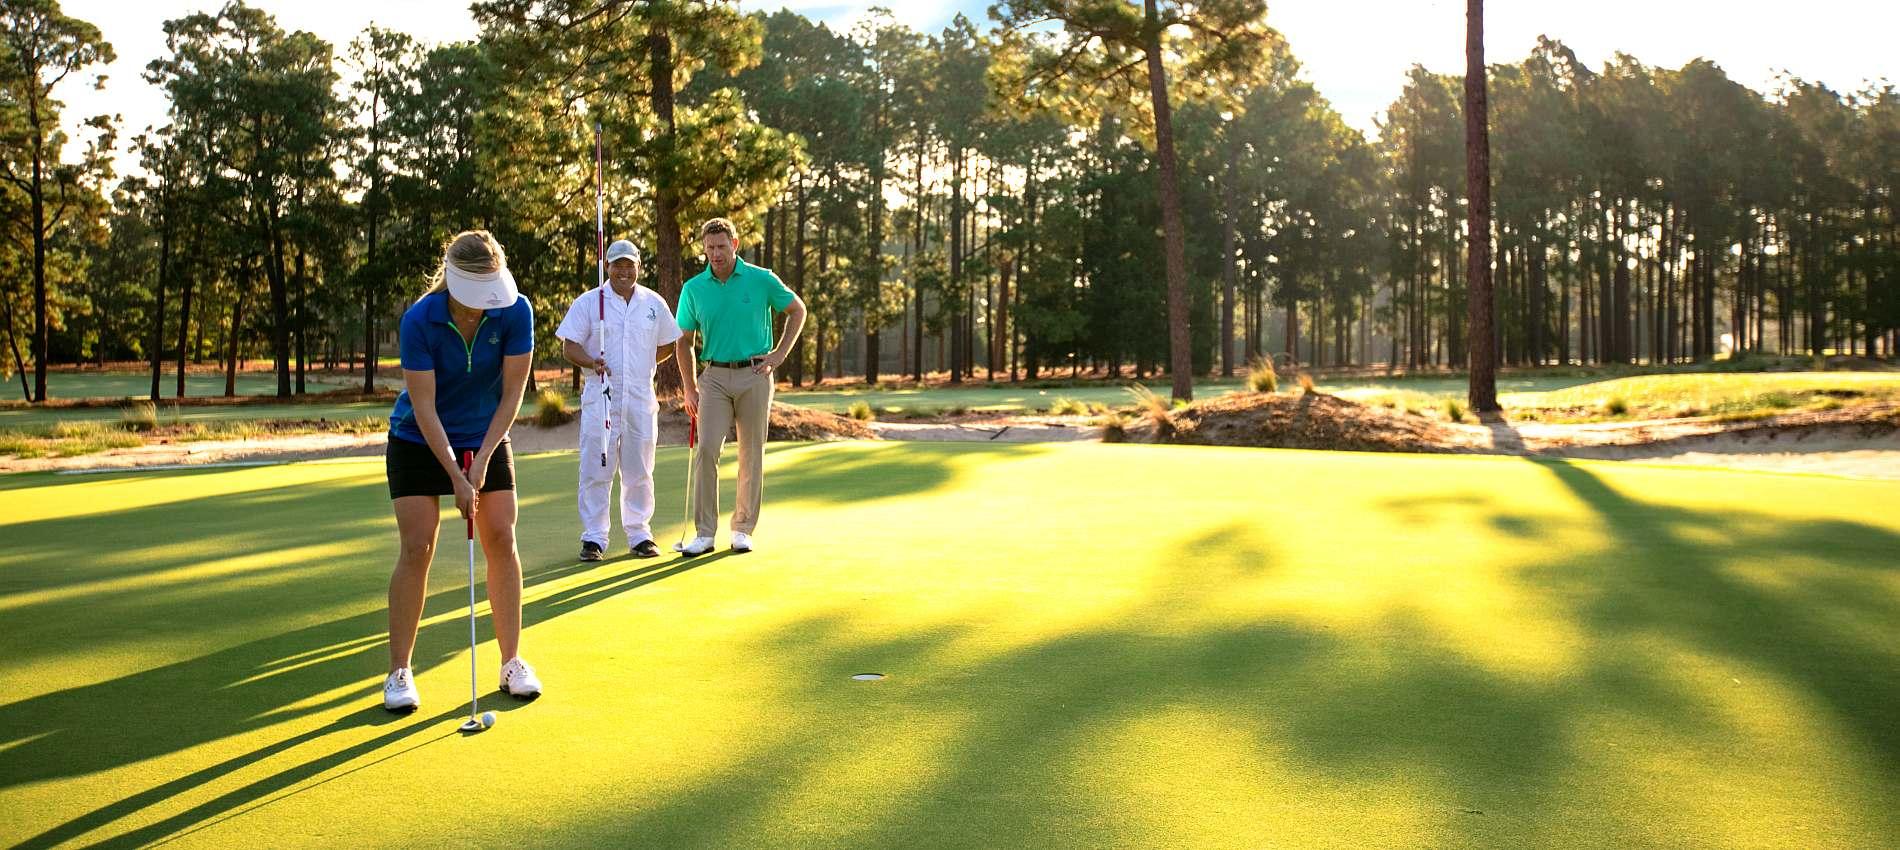 members golfing with caddie